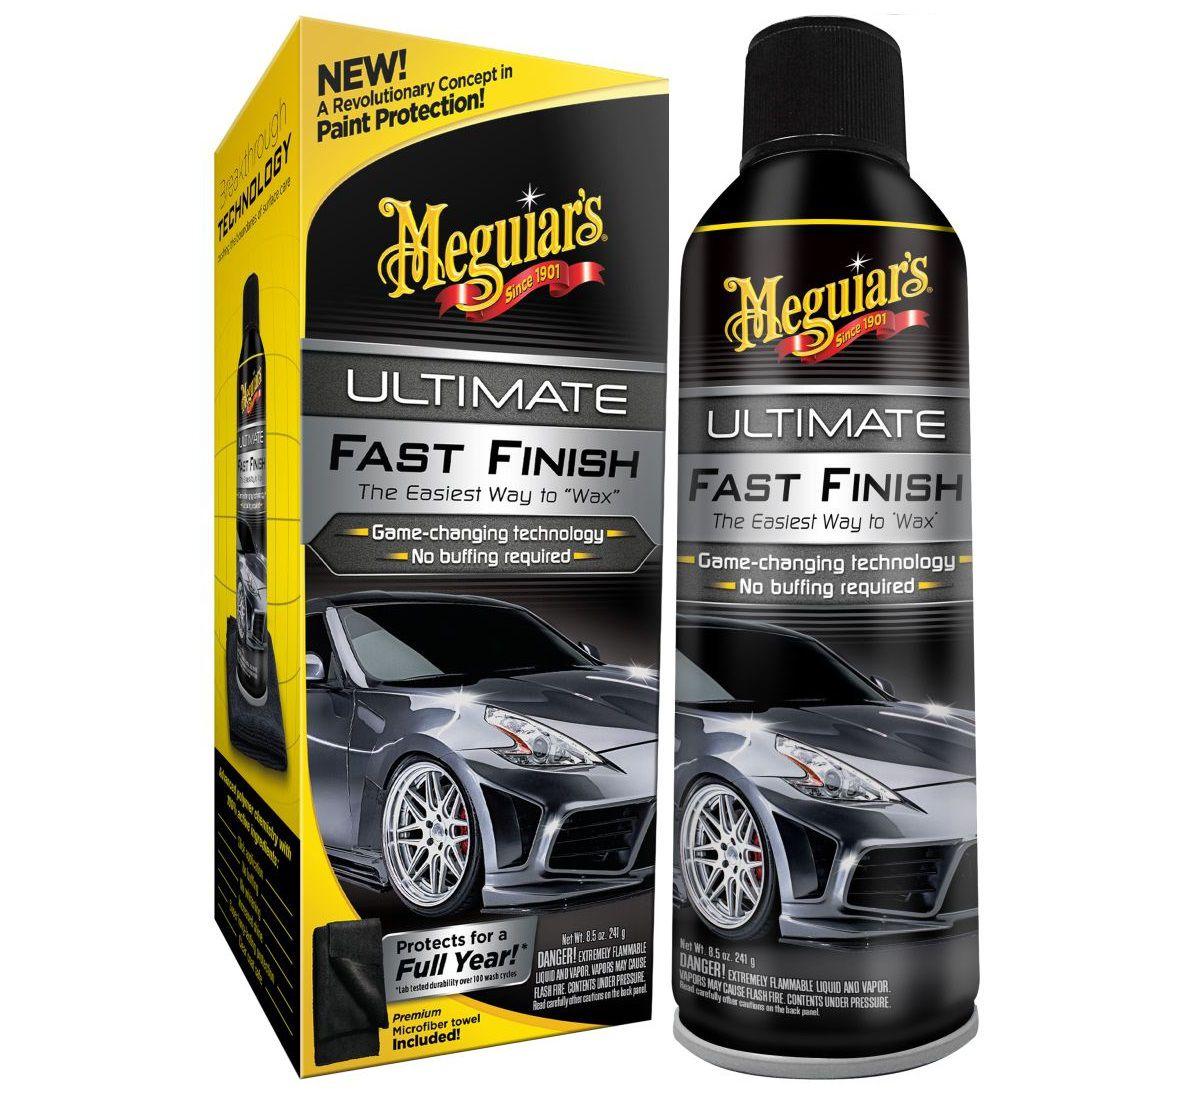 Cera Protetora Spray Ultimate Fast Finish 251,4ml Meguiars